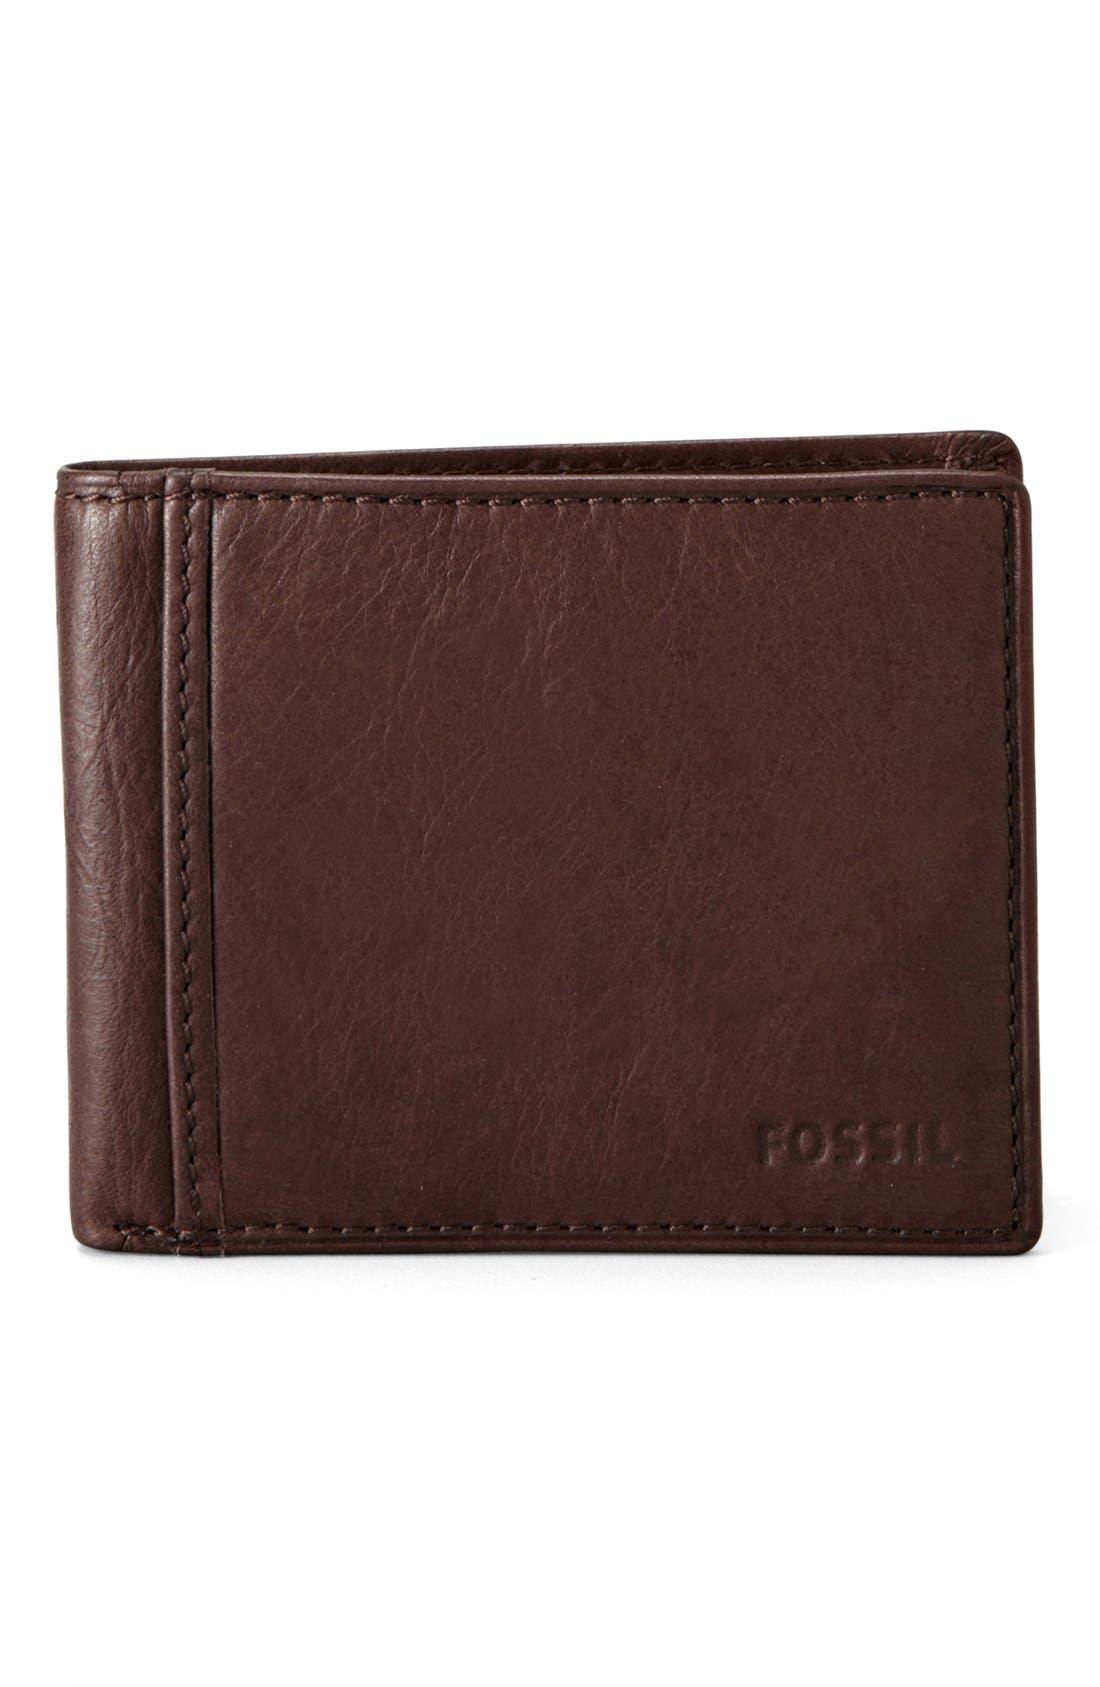 FOSSIL Ingram Traveler Wallet